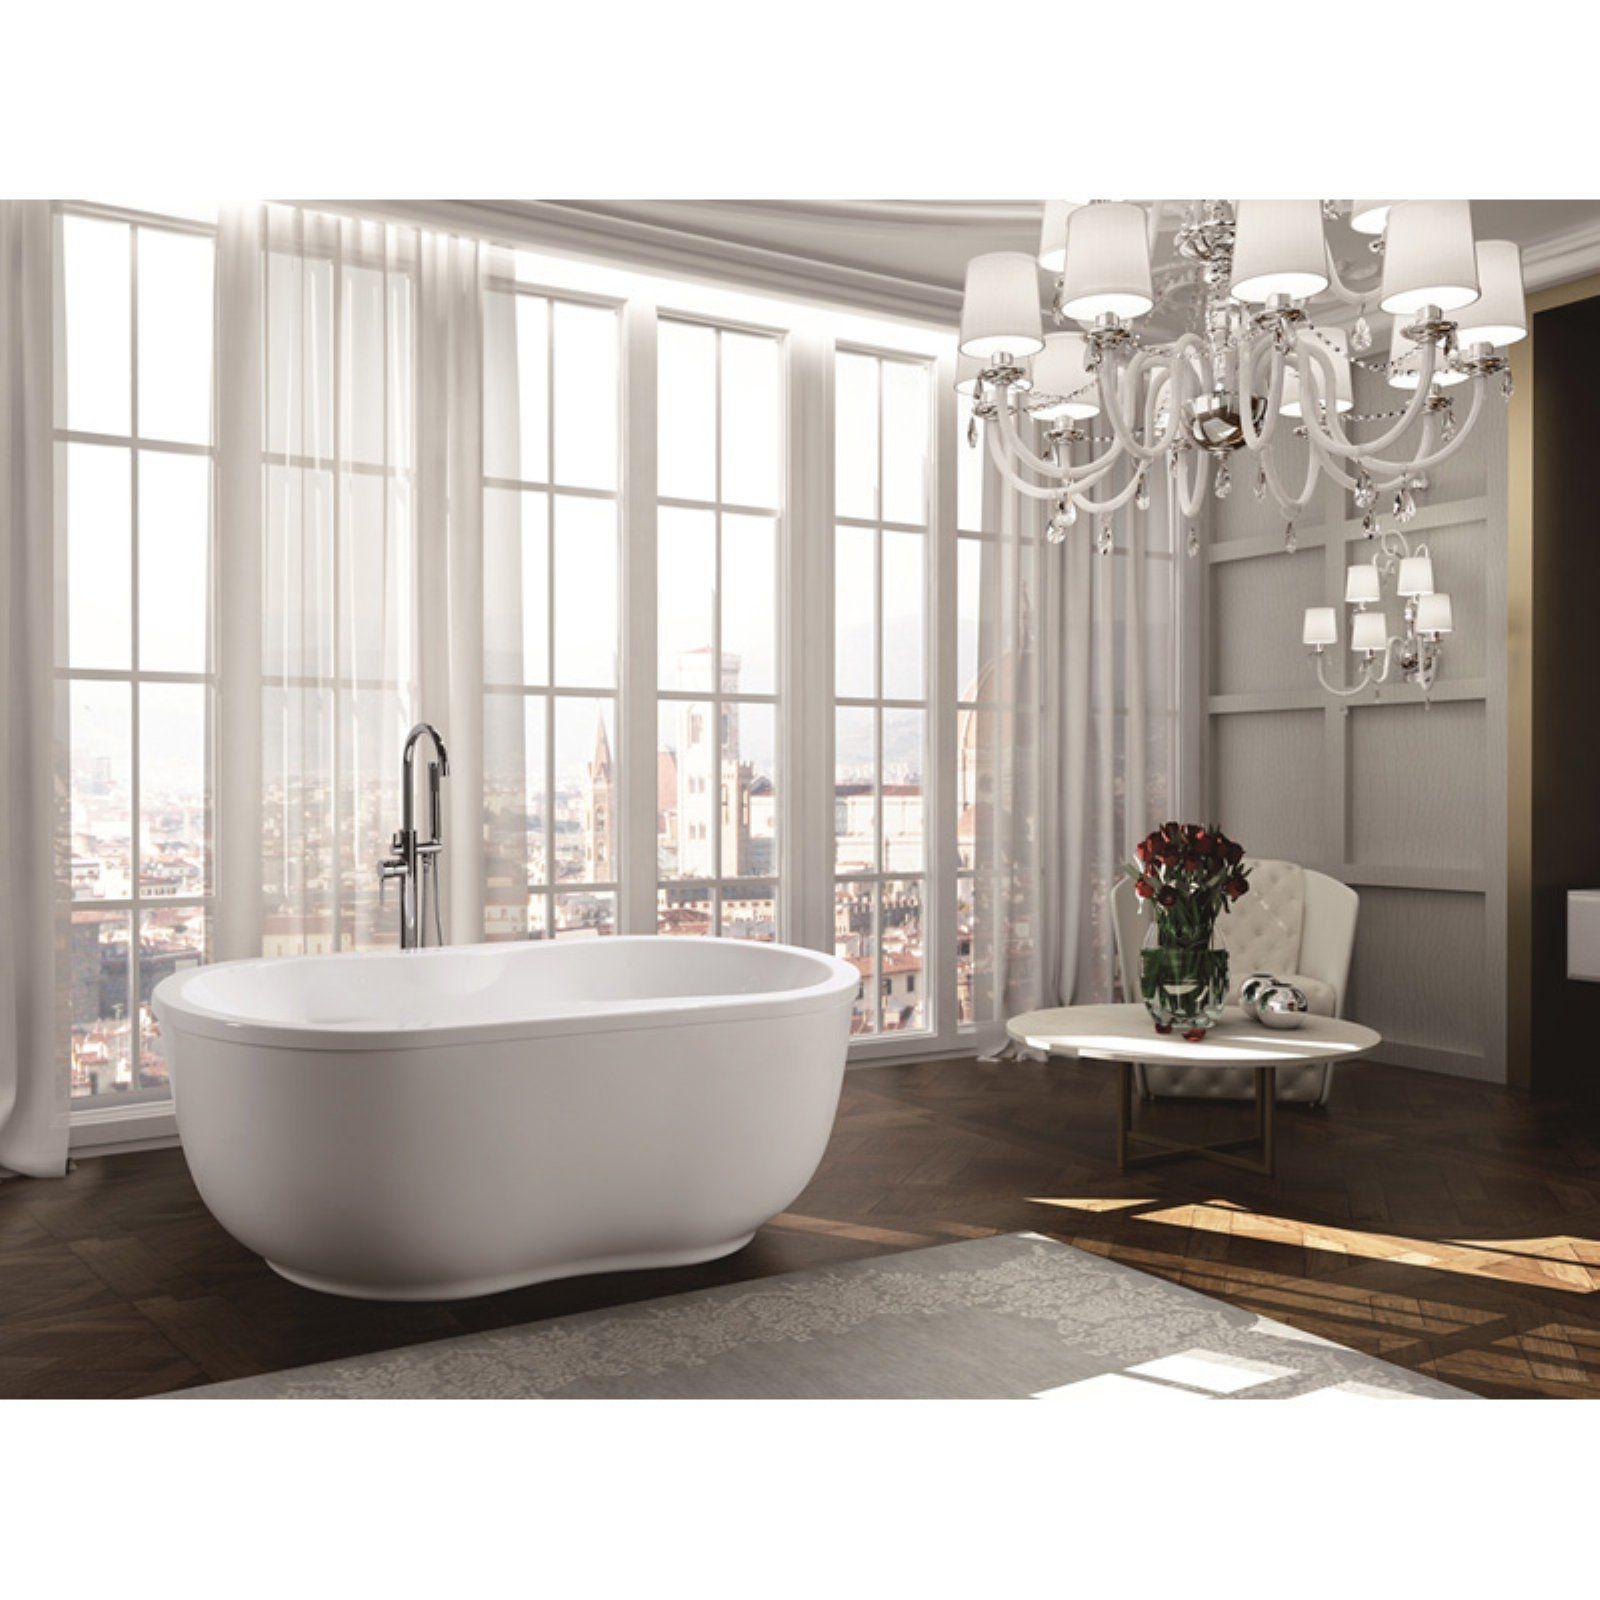 Bellaterra Home Brescia 65 In Freestanding Bathtub Free Standing Bath Tub